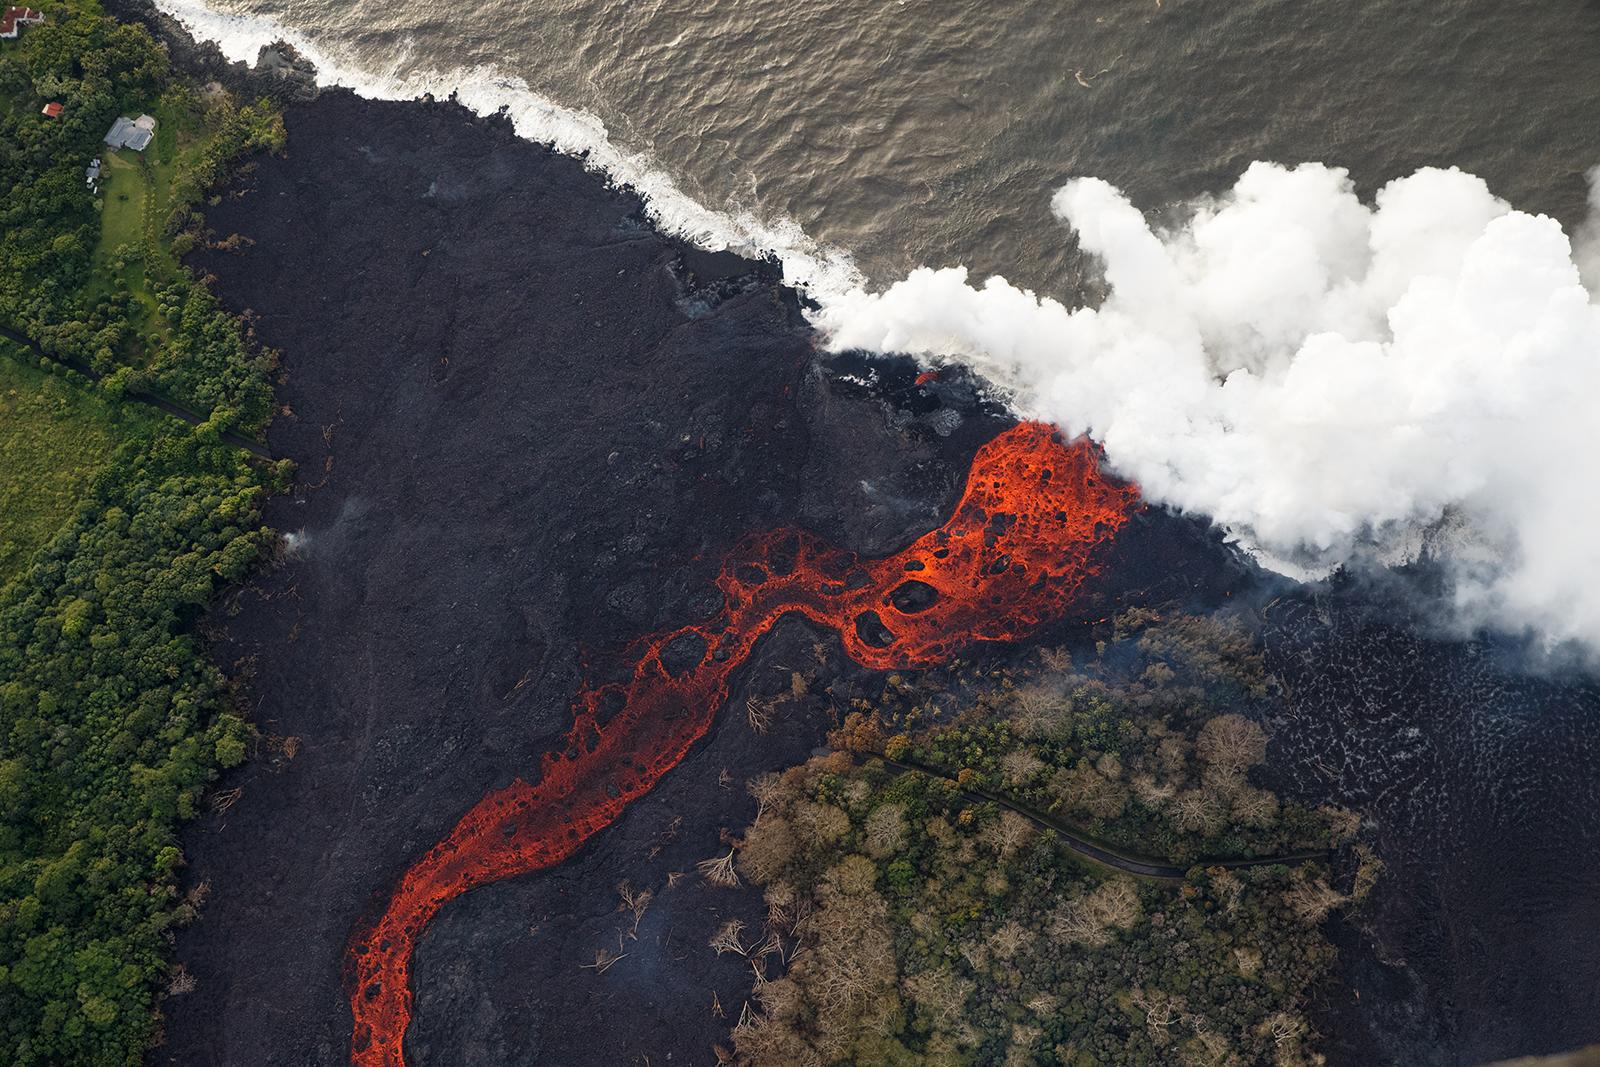 https://qz.com/wp-content/uploads/2018/05/hawaii_volcano_17.jpg?quality=80&strip=all&w=1600